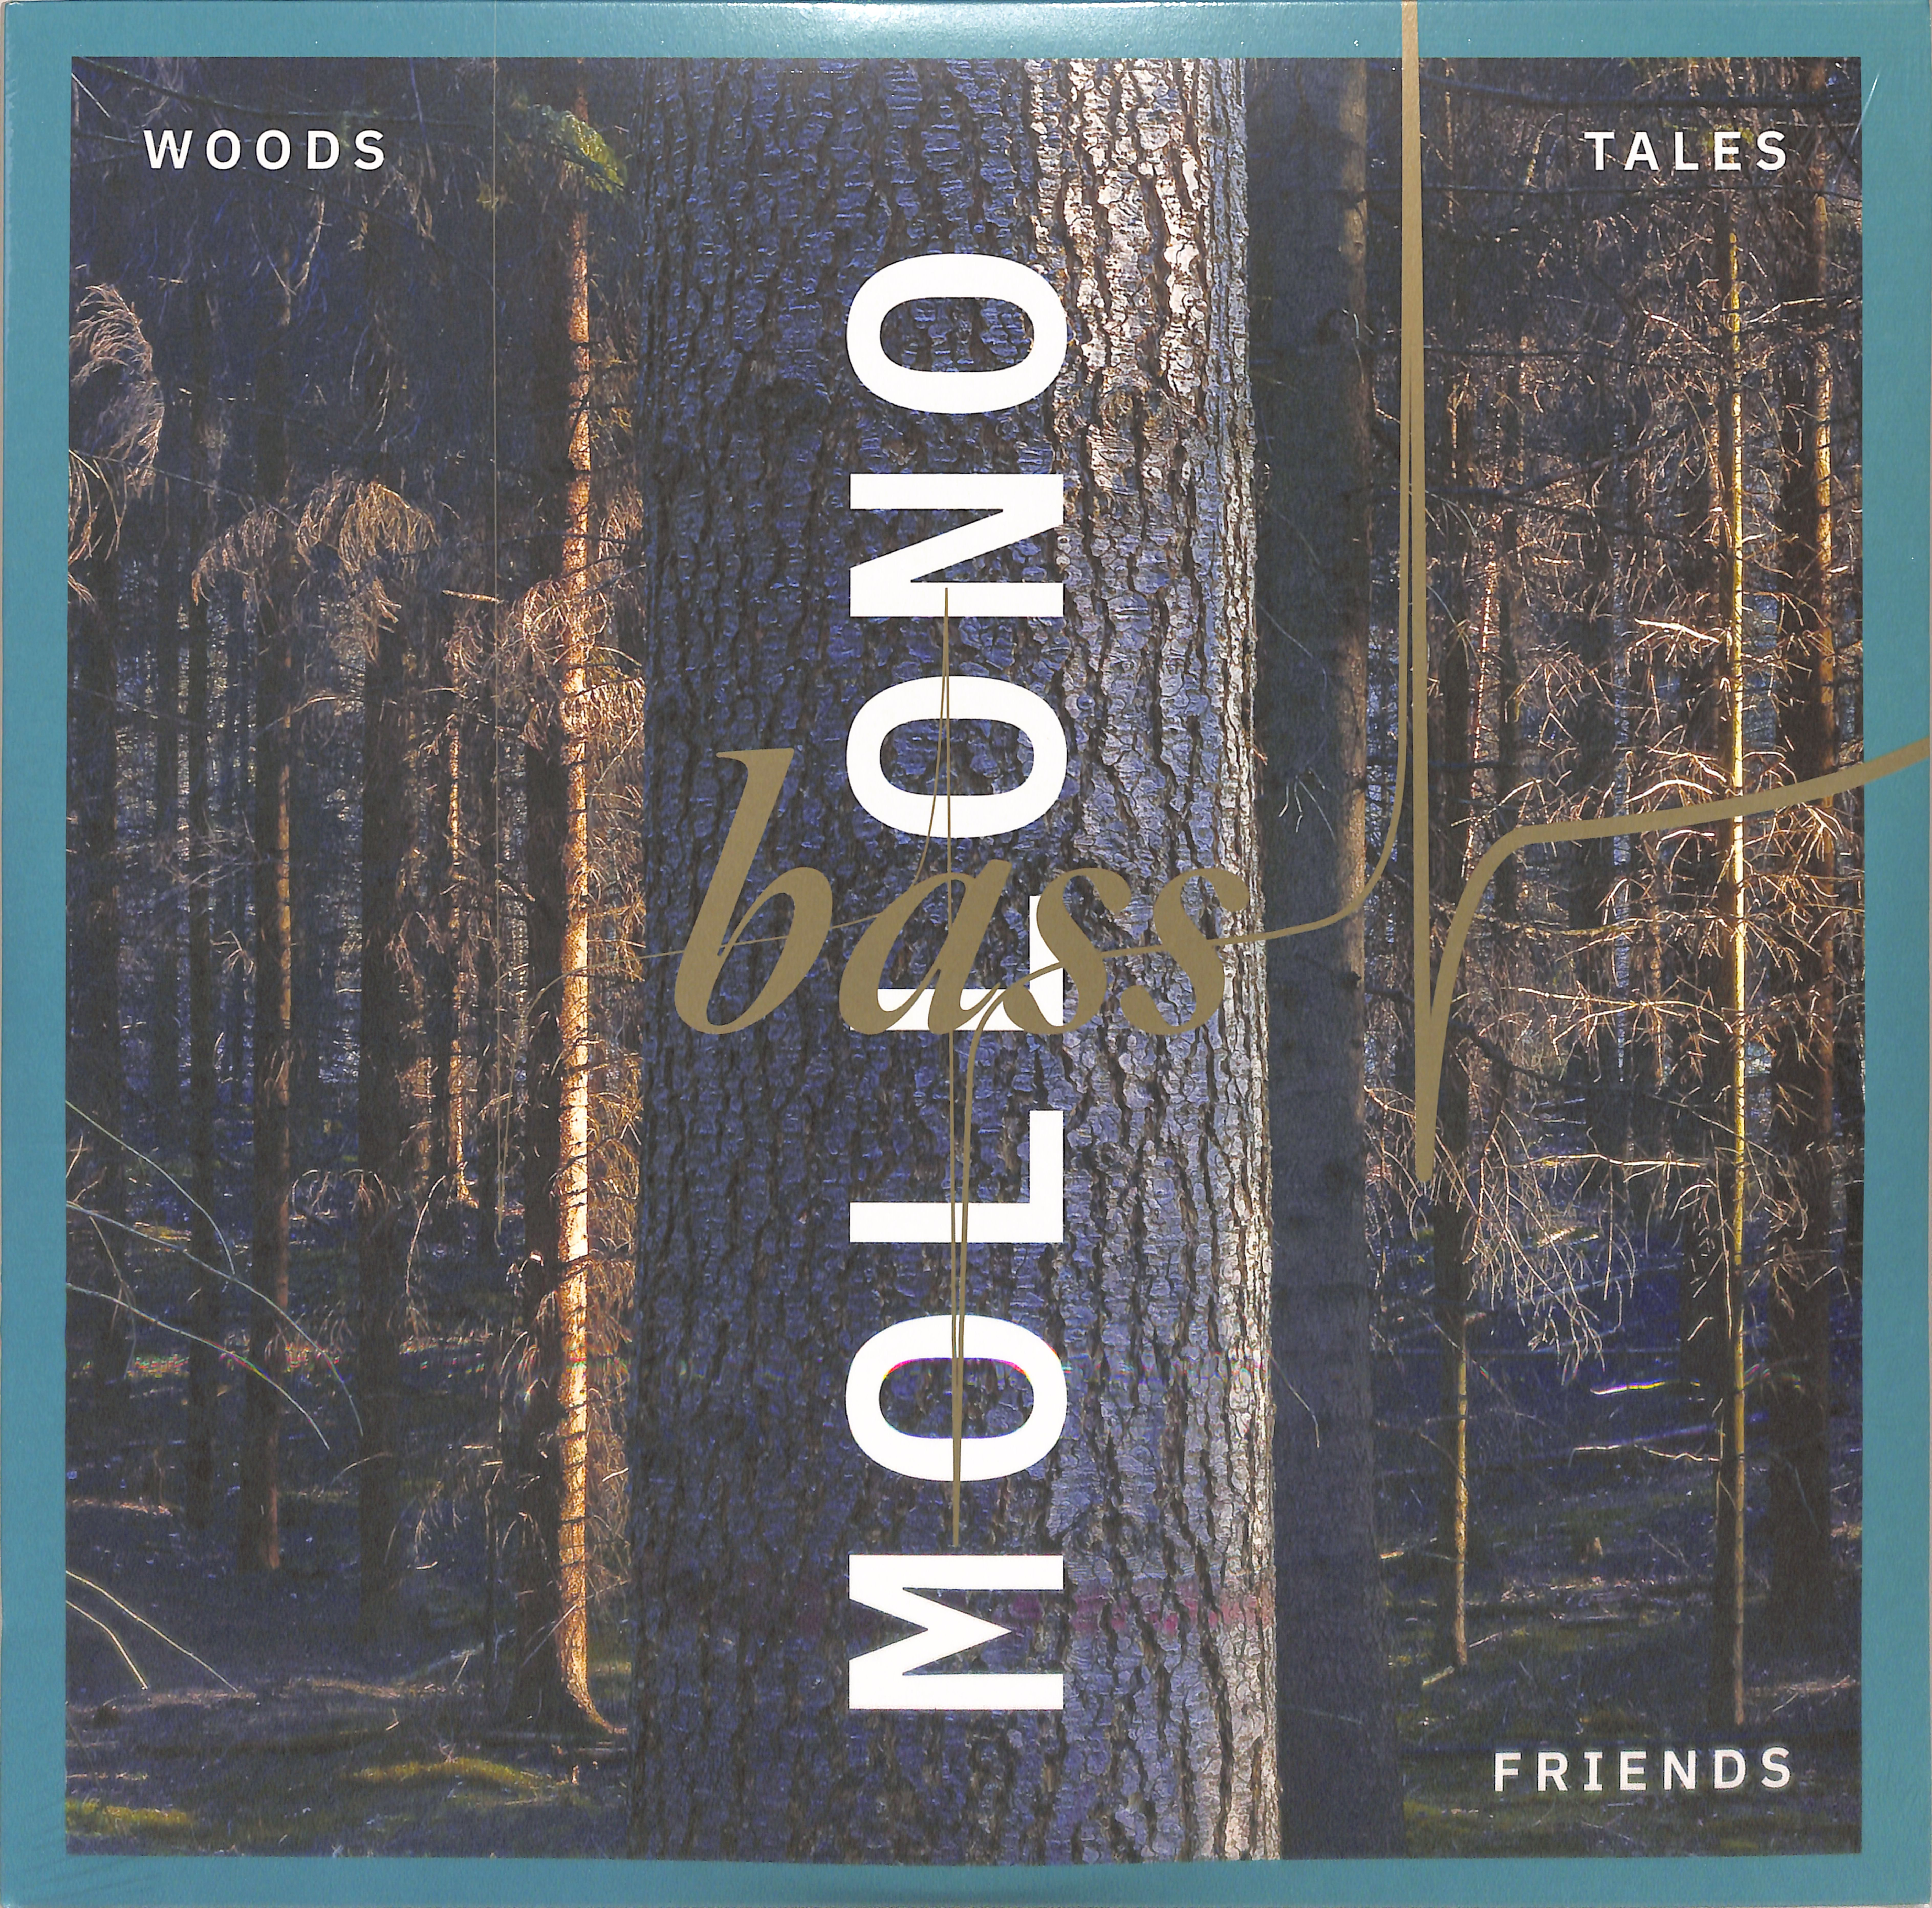 Mollono.Bass - WOODS, TALES & FRIENDS